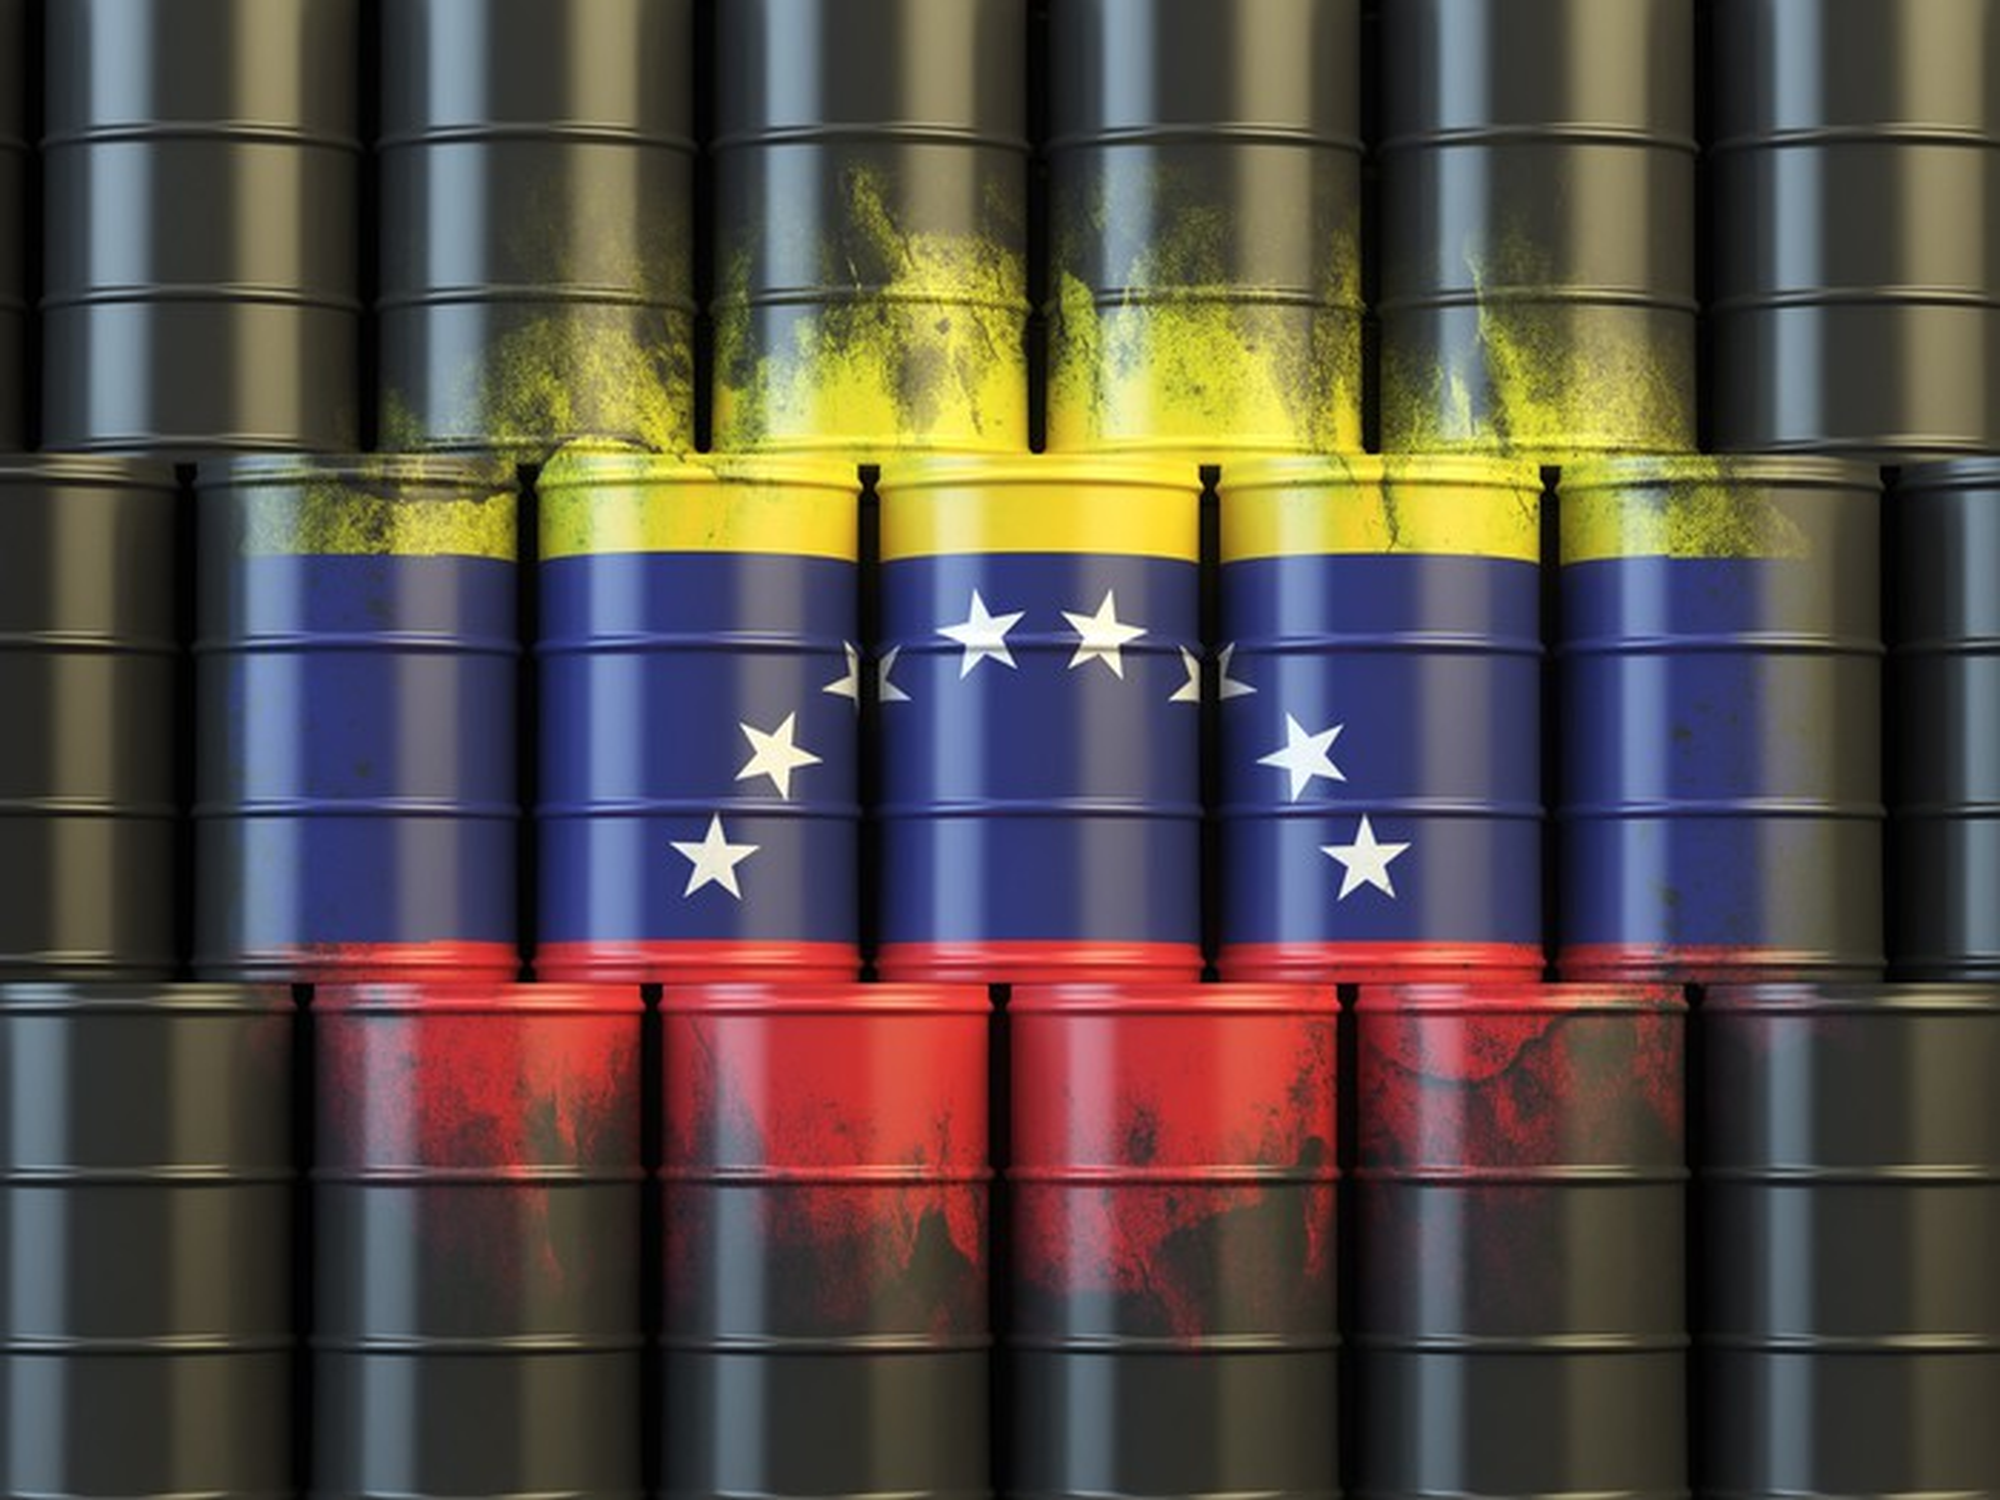 Venezuelan flag painted on oil barrels.